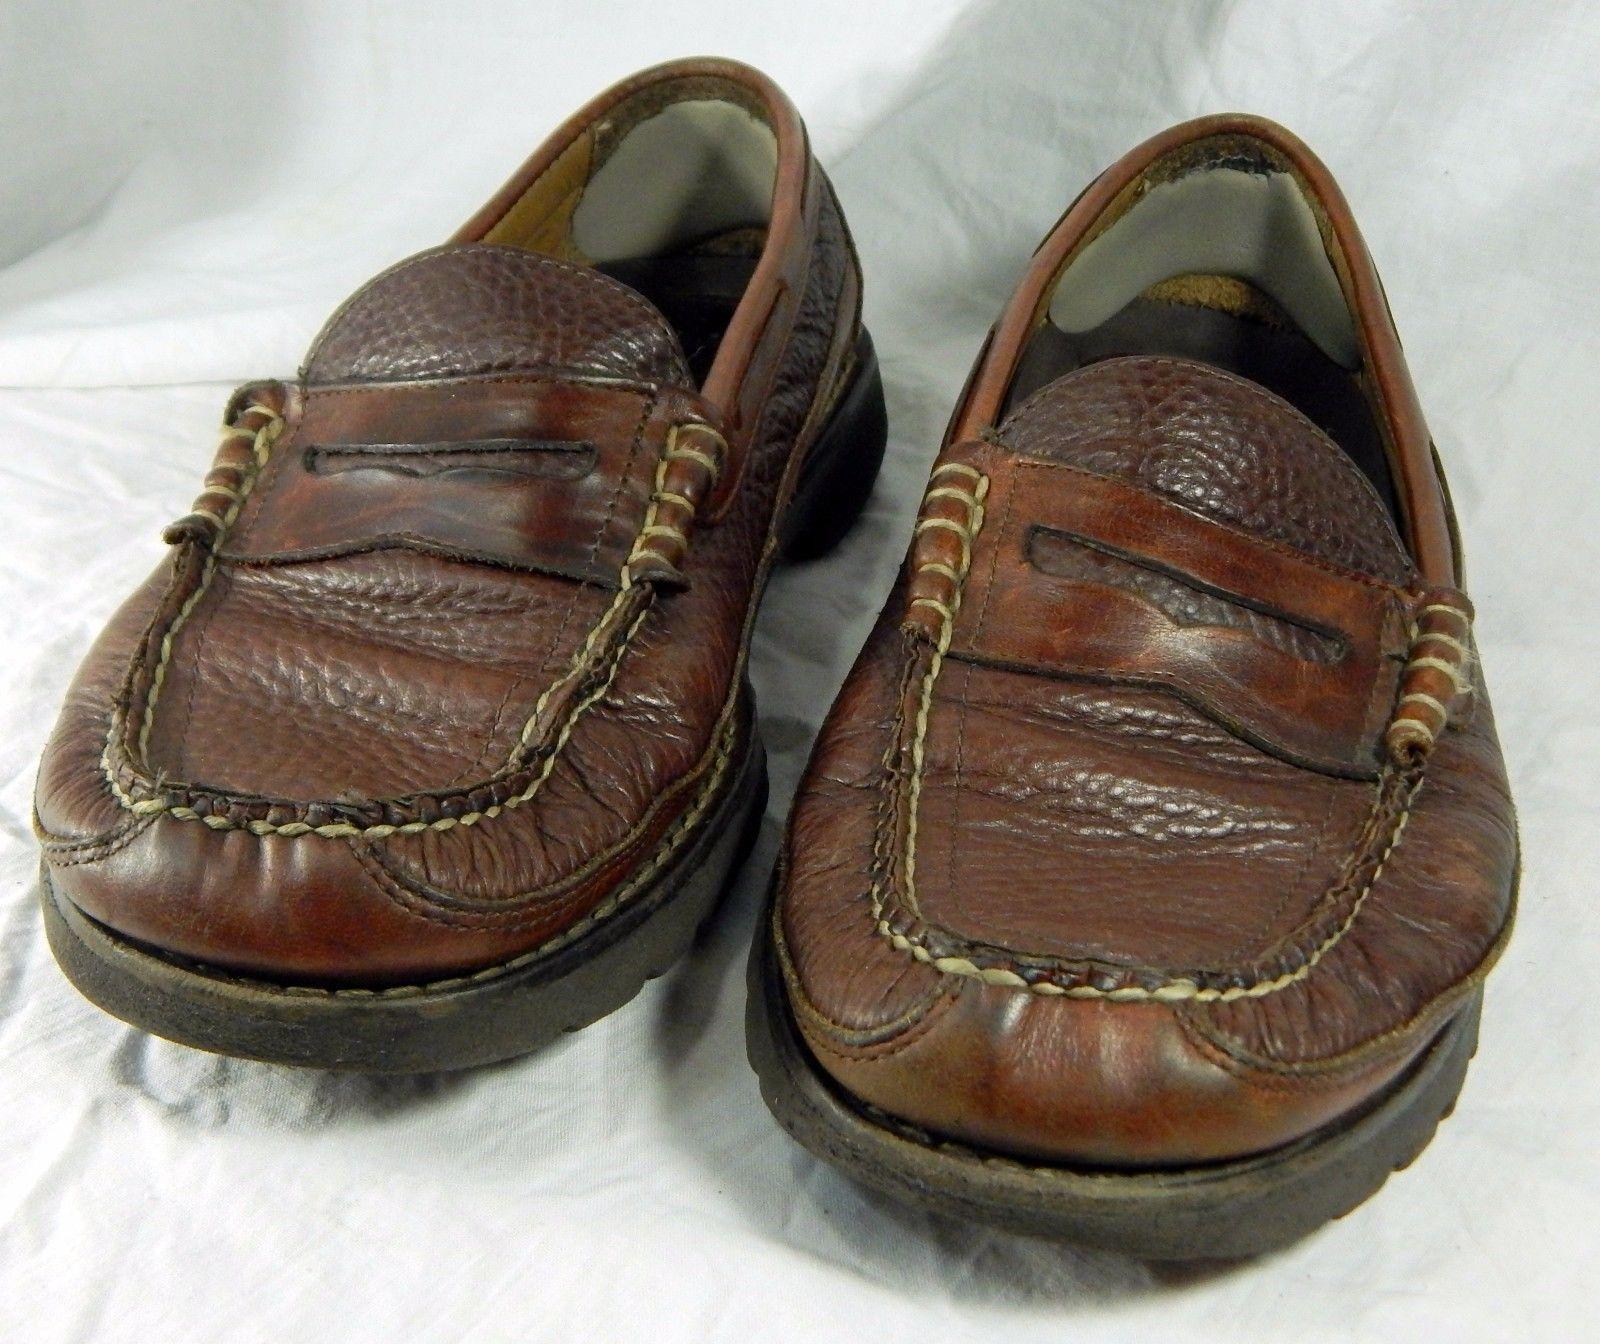 8c3d12acedd Vintage L.L. Bean Slip On Loafer Leather and 50 similar items